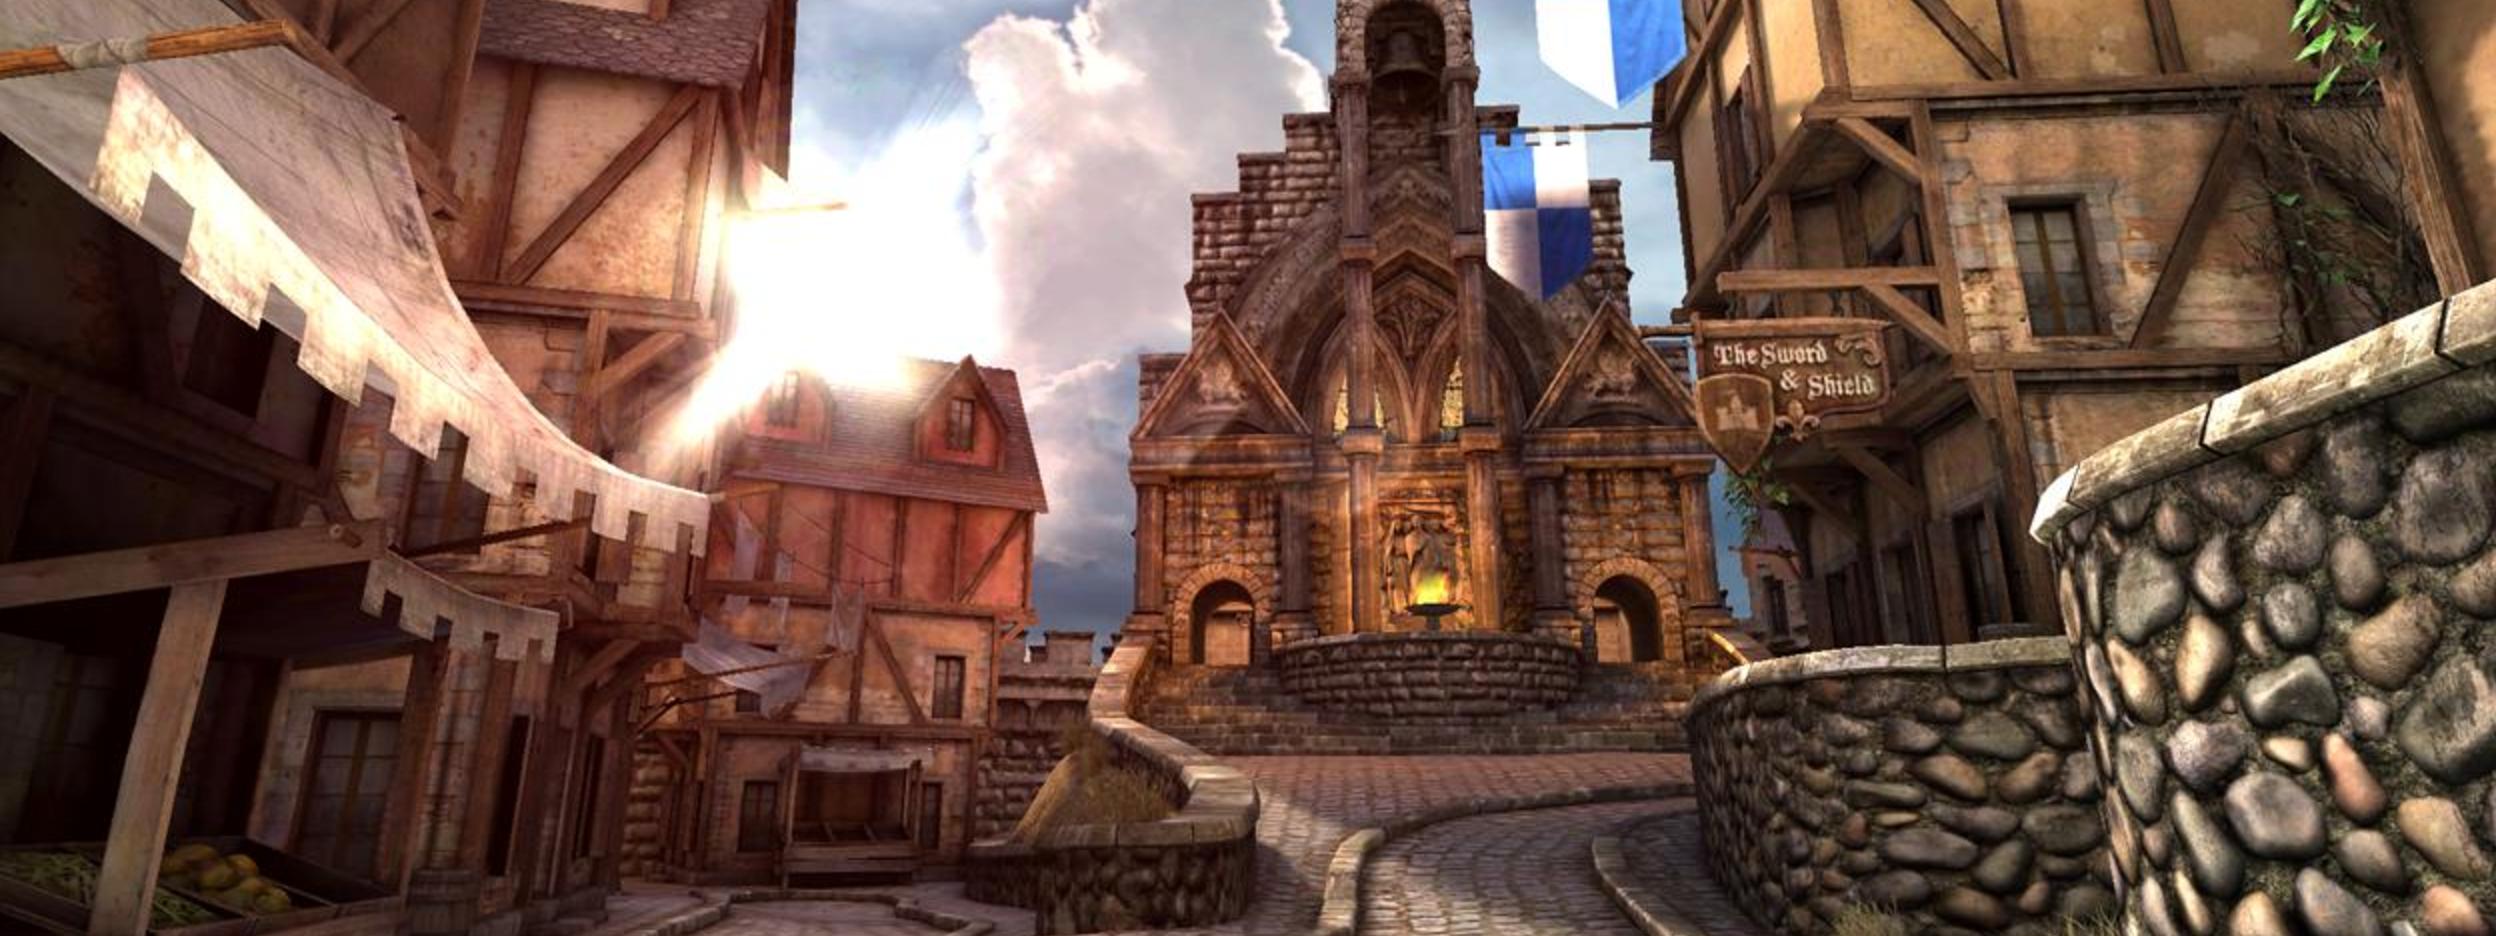 WebGL needs a Home - By